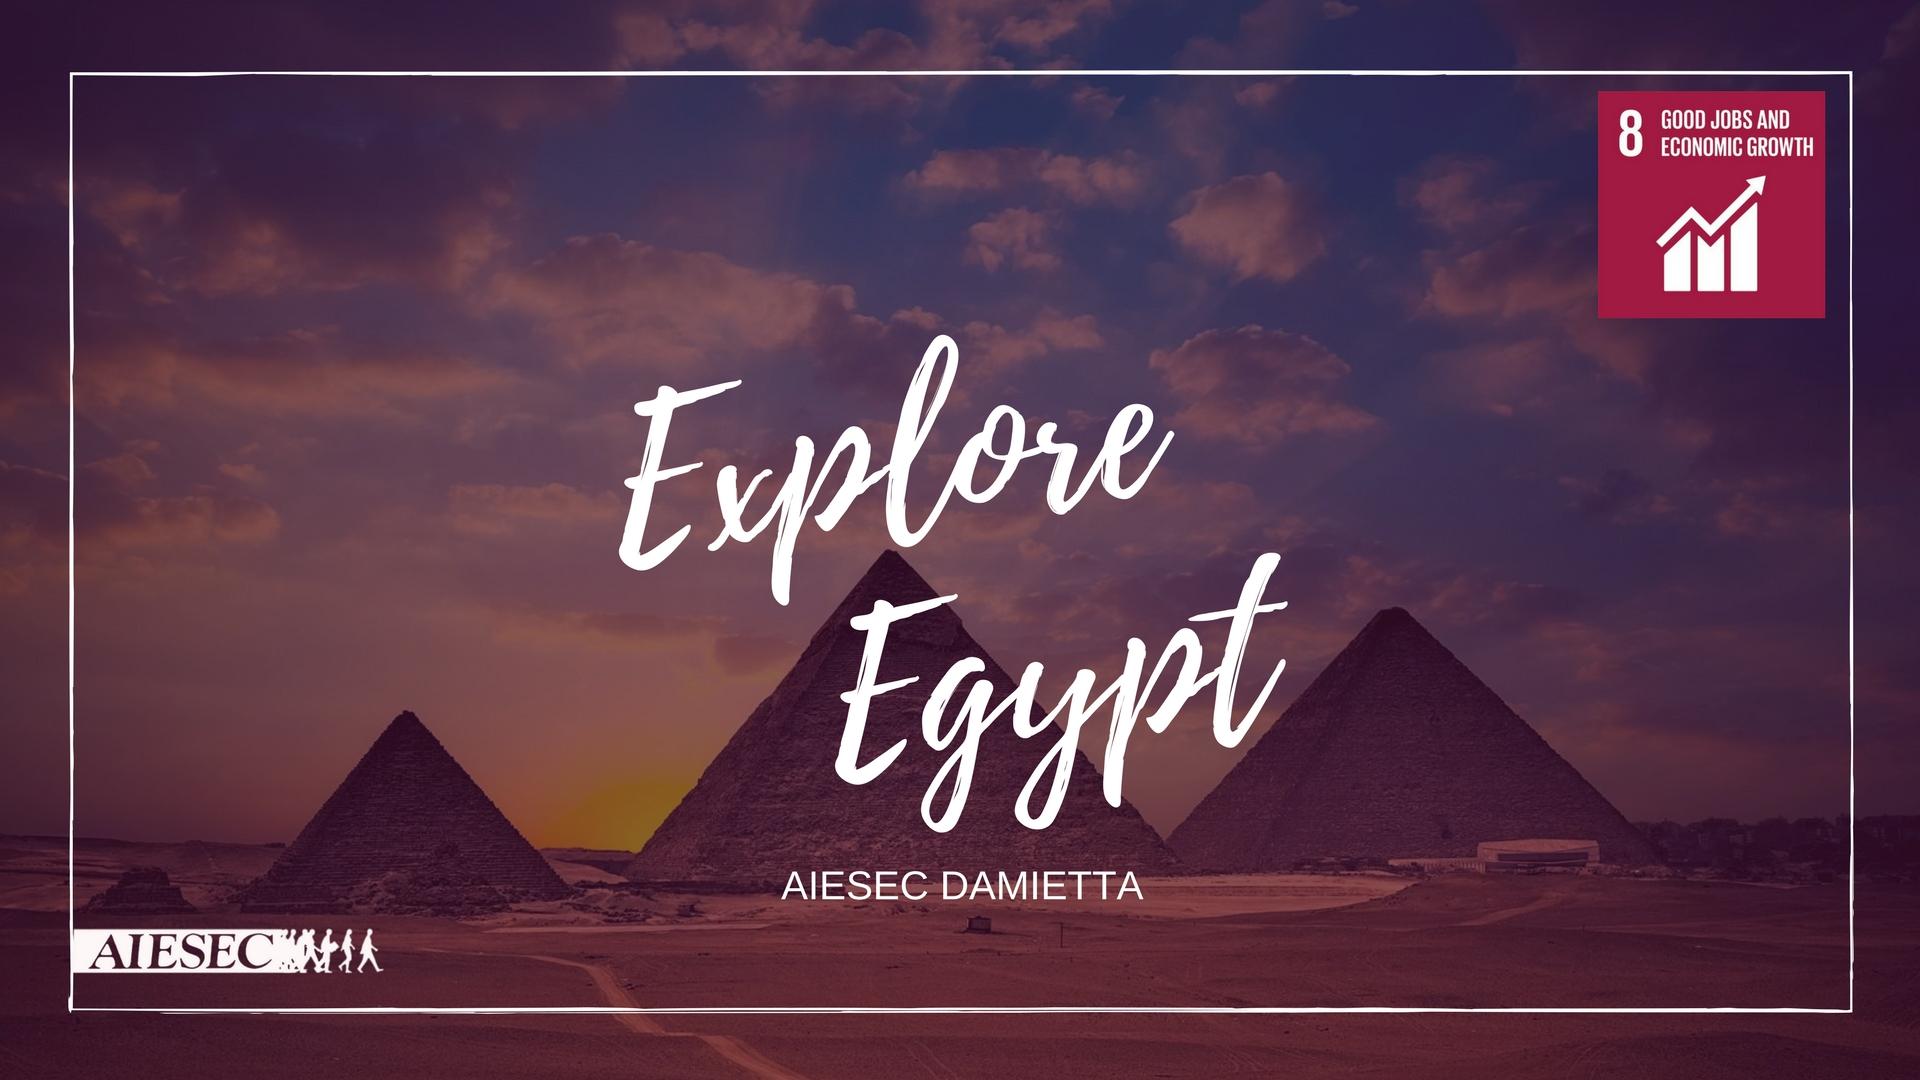 Explore  Egypt  for promoting tourism